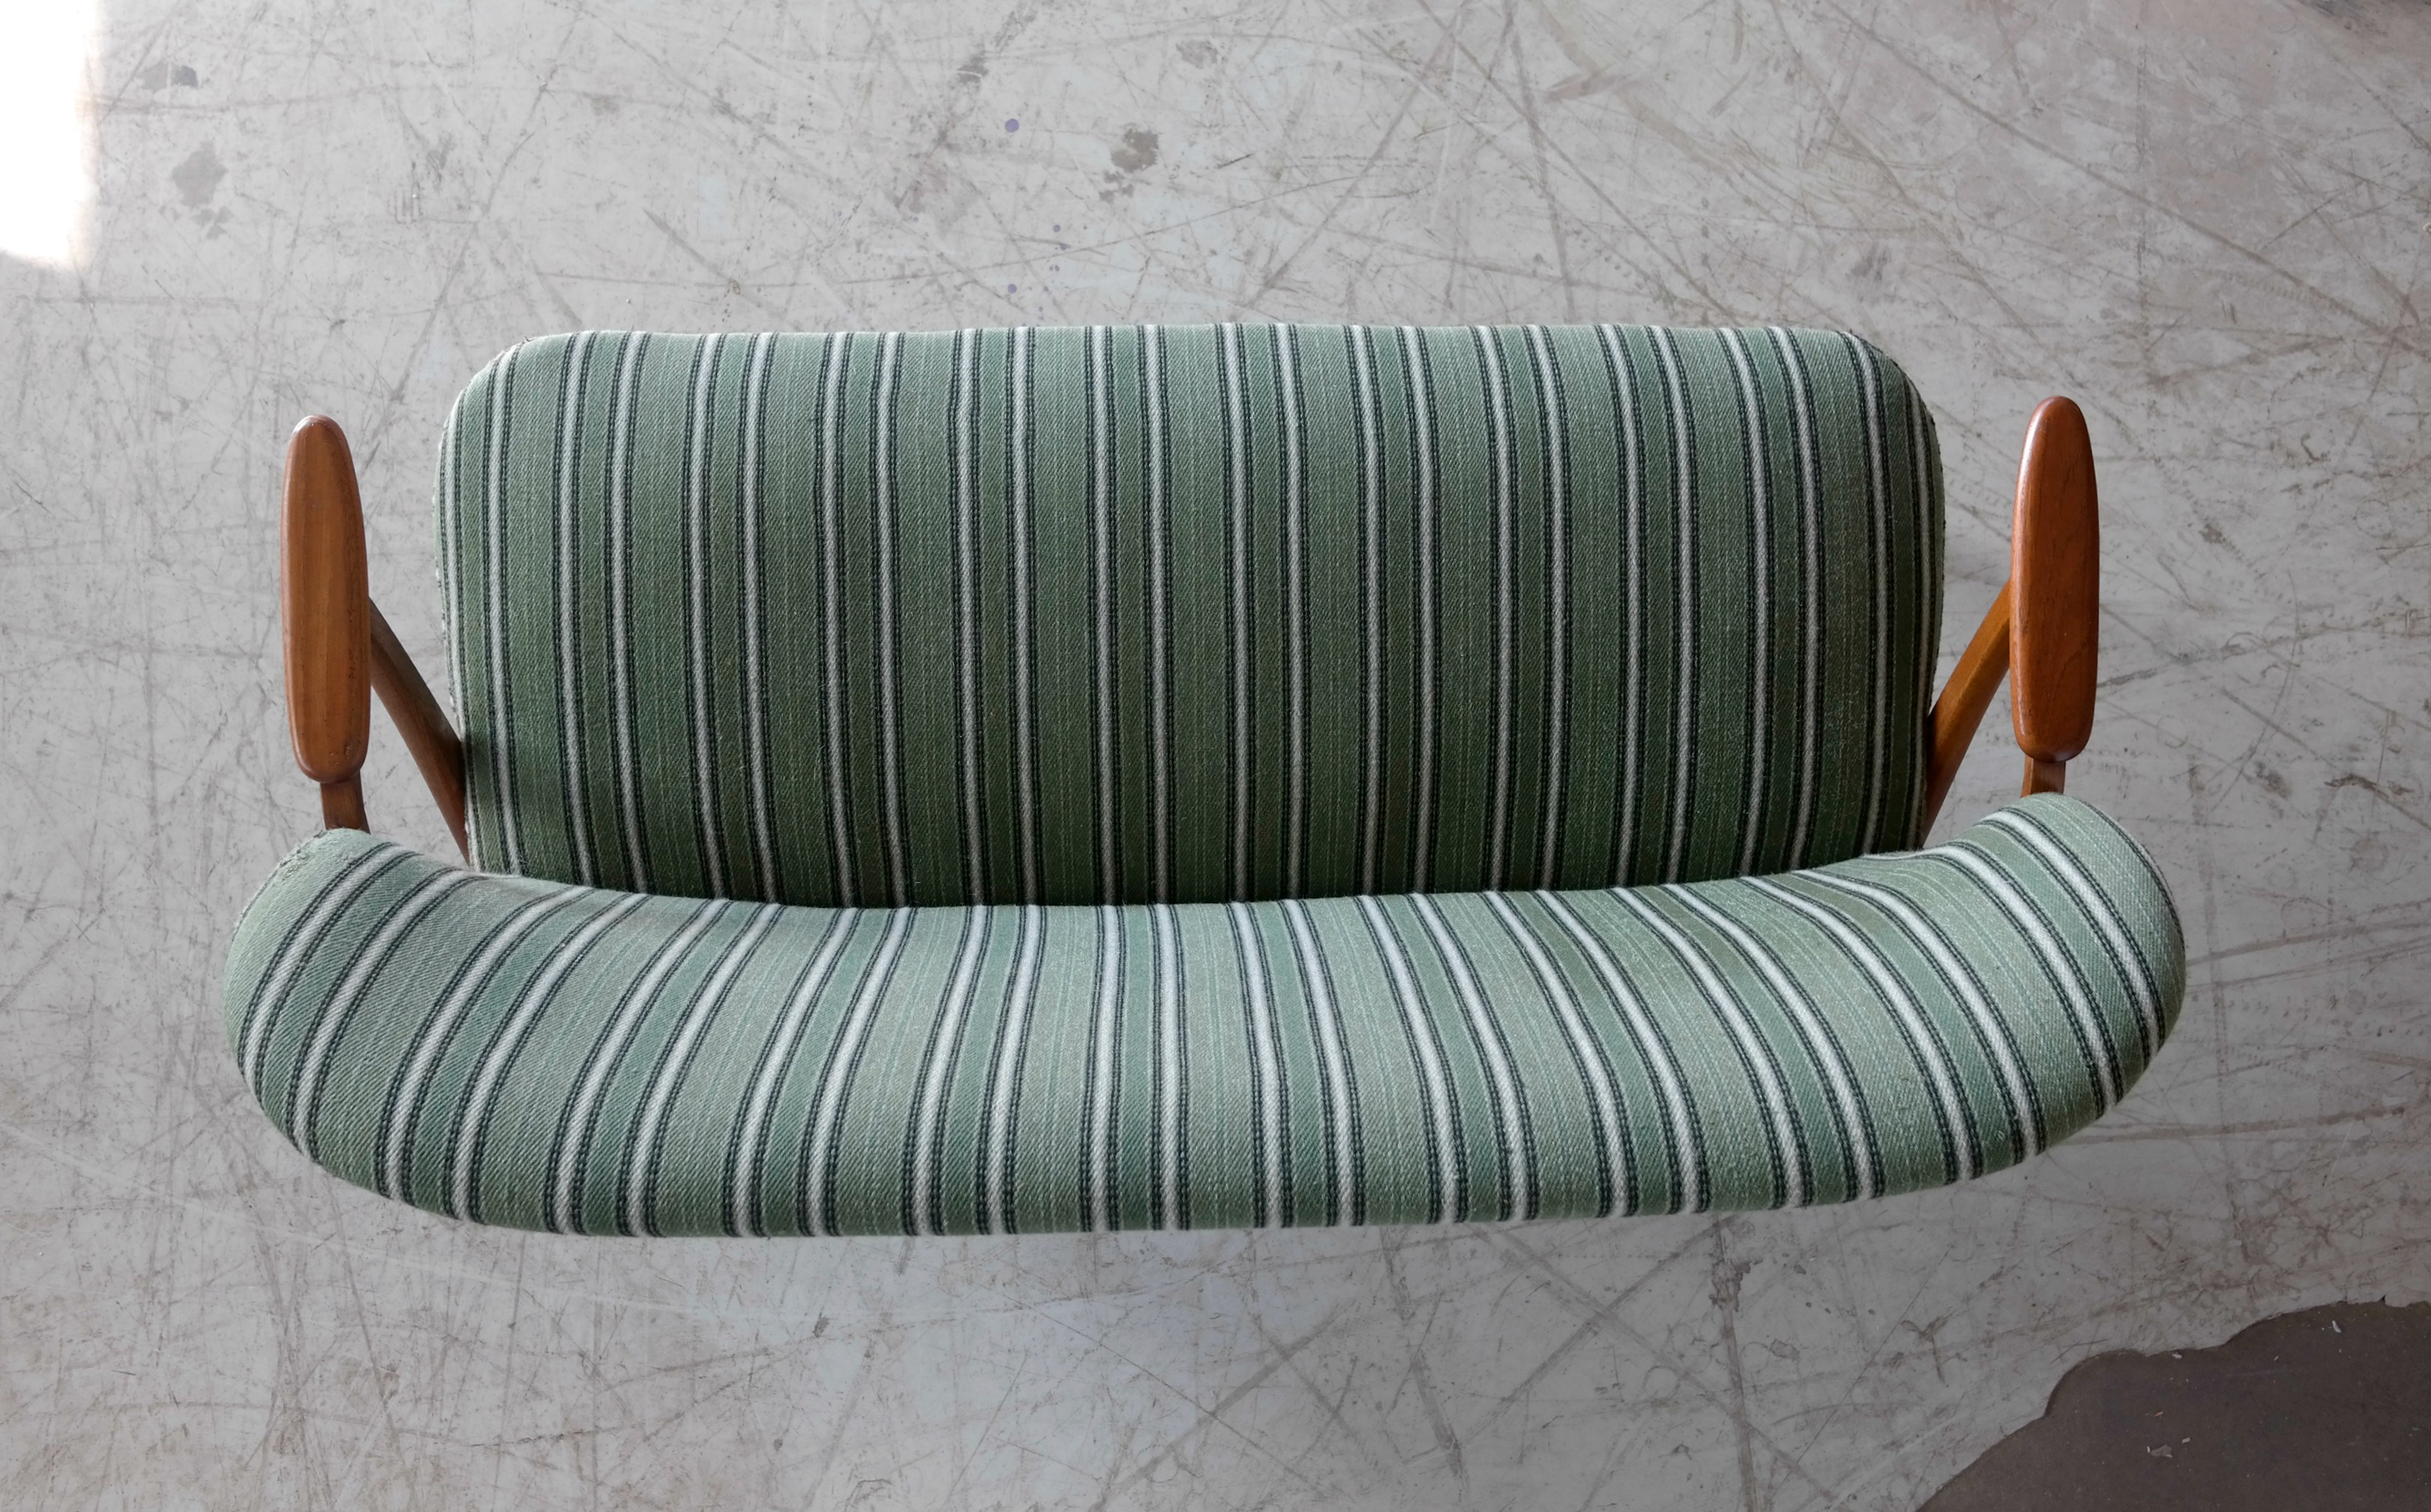 Danish Midcentury Sofa With Teak Armrests In The Style Of Kurt Olsen For  Bramin   Image